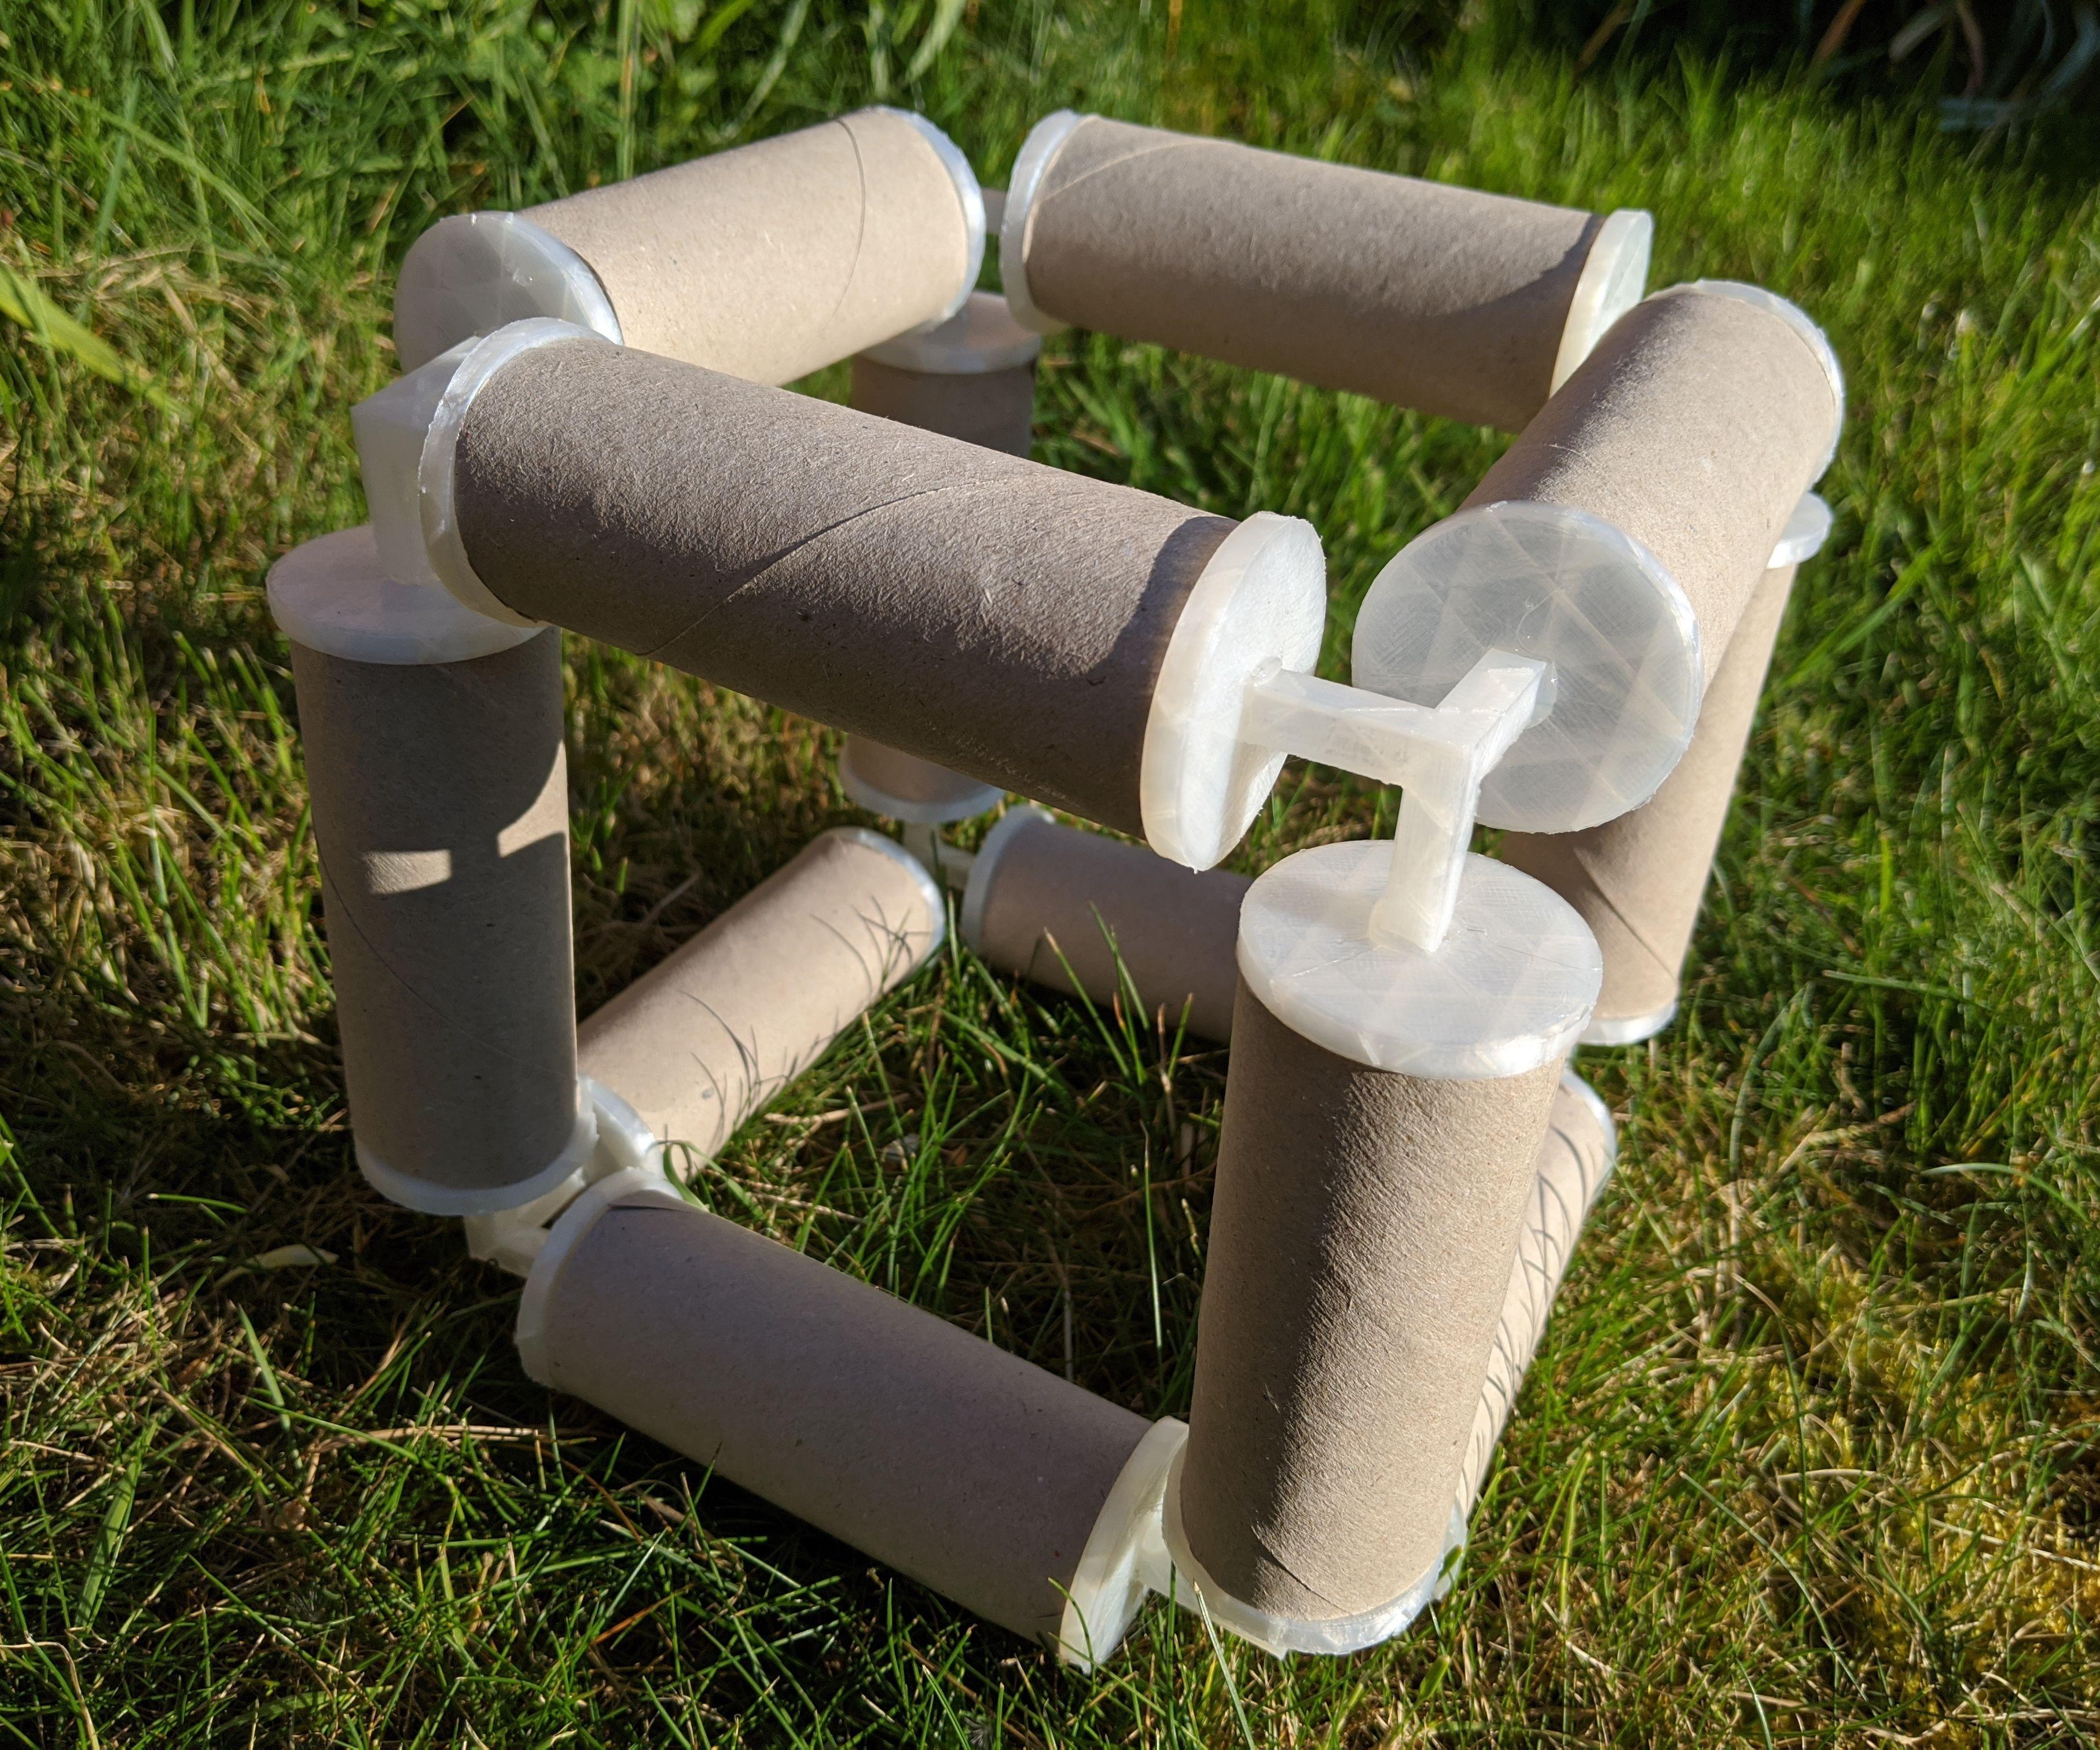 Turn Toilet Rolls Into Construction Toys